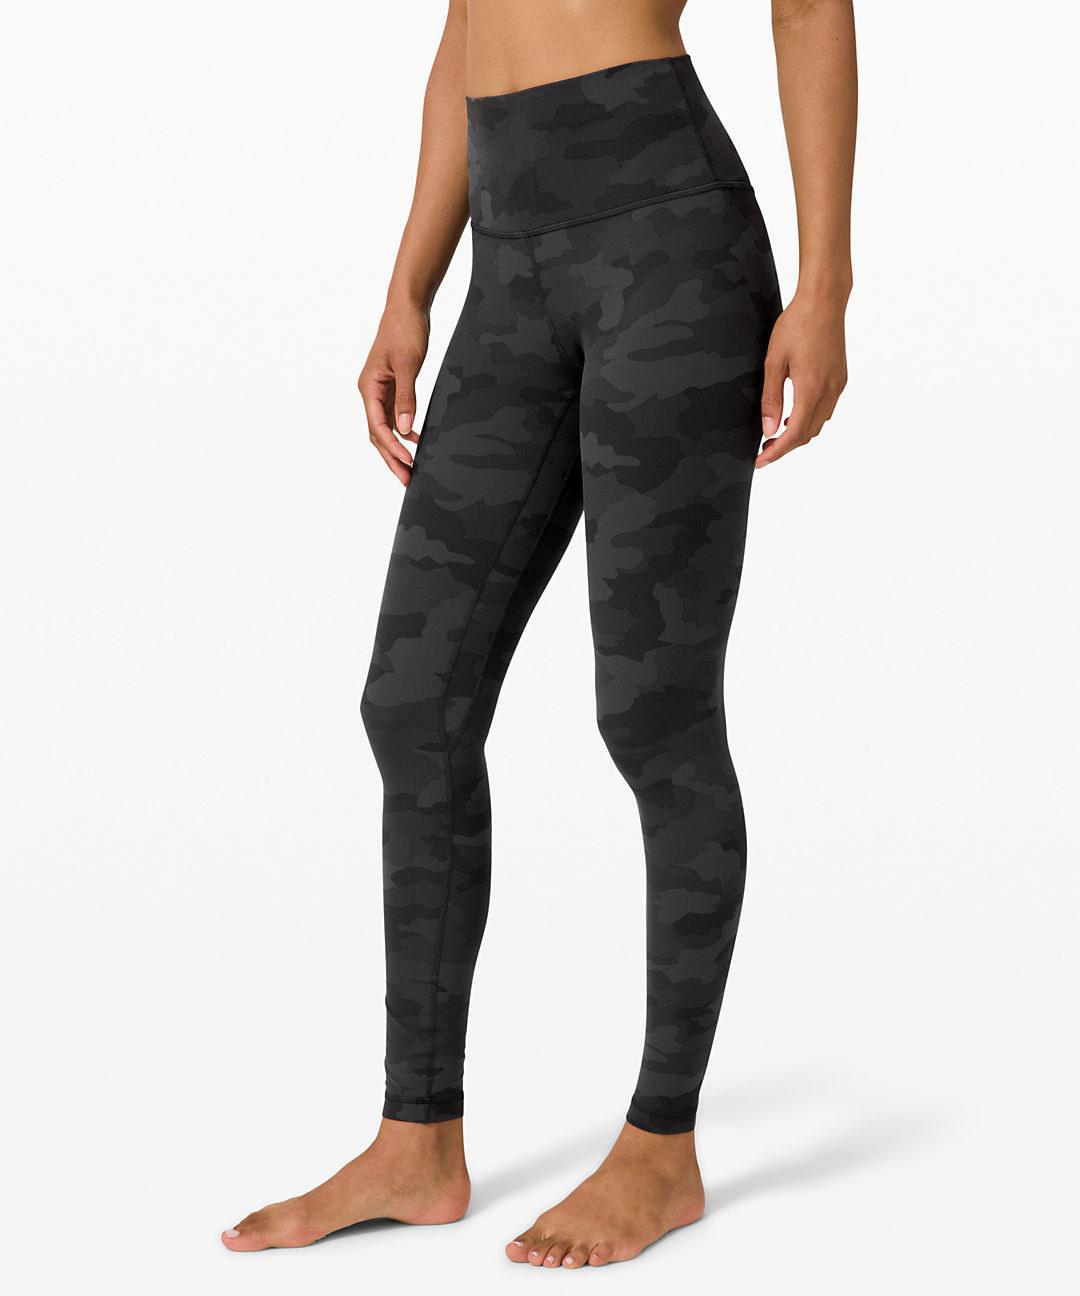 model wearing the full-length high-waisted leggings in black and dark grey camo